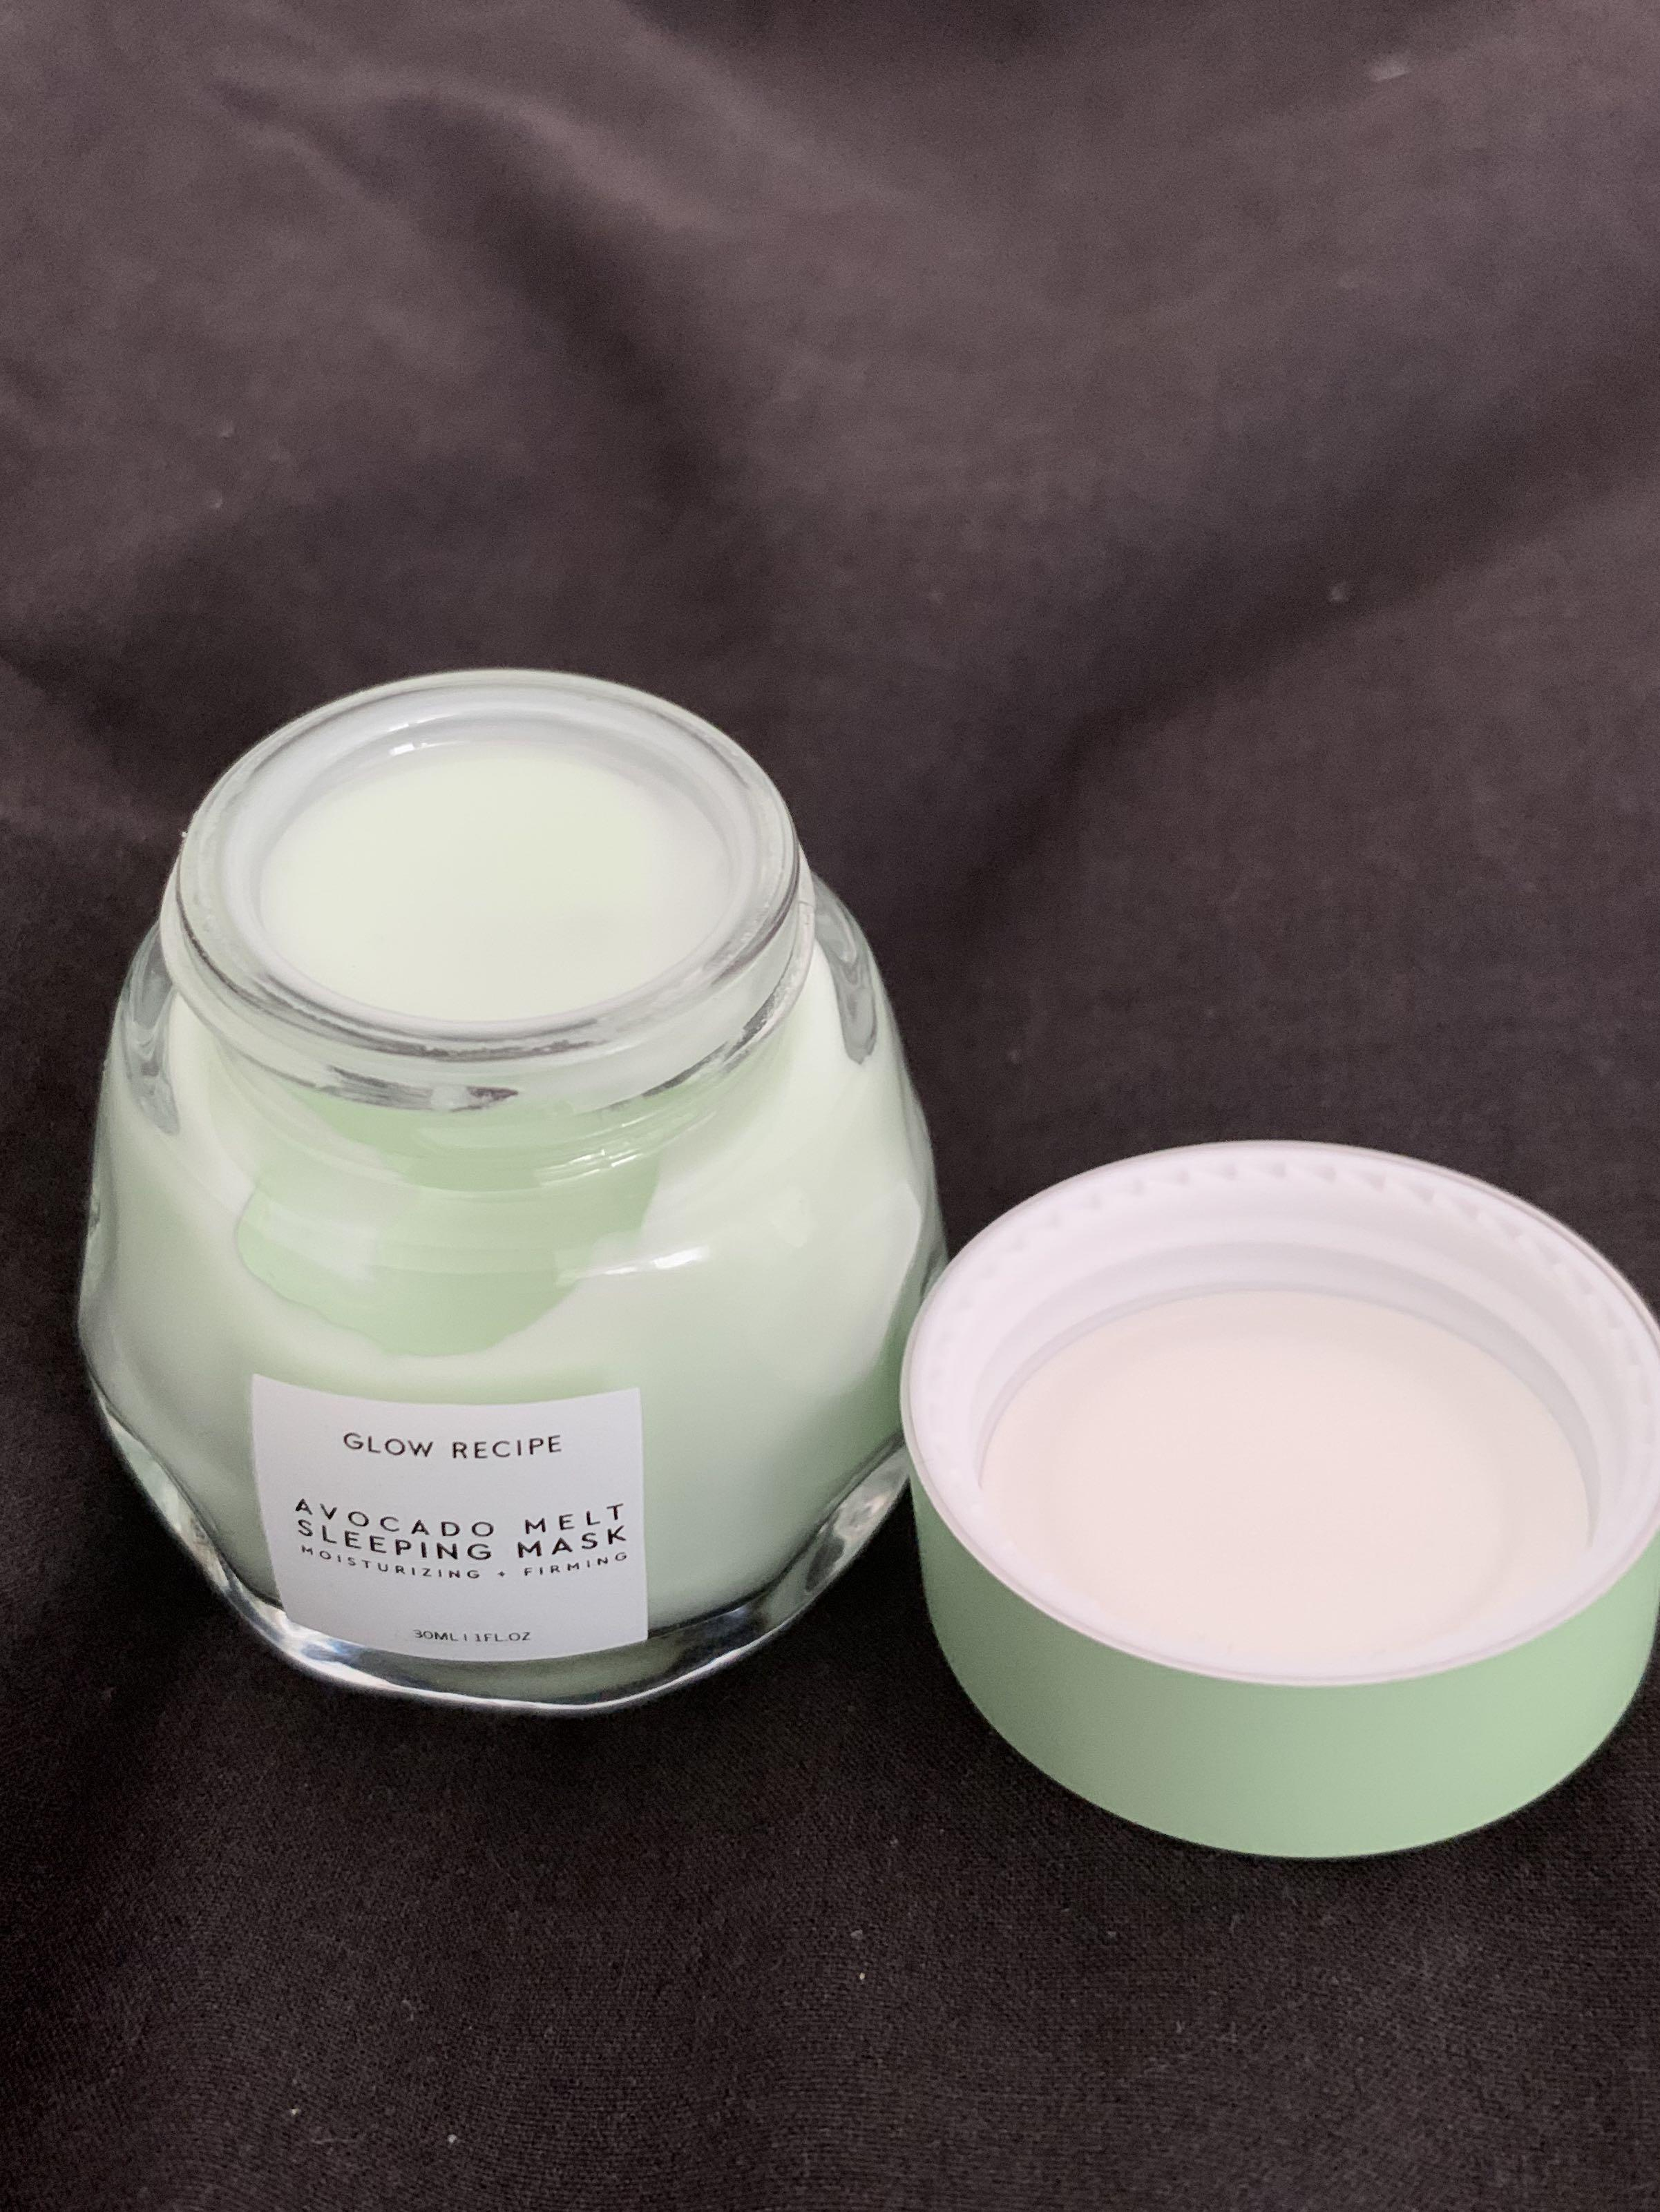 Glow recipe avocado melt sleeping mask 30ml brand new